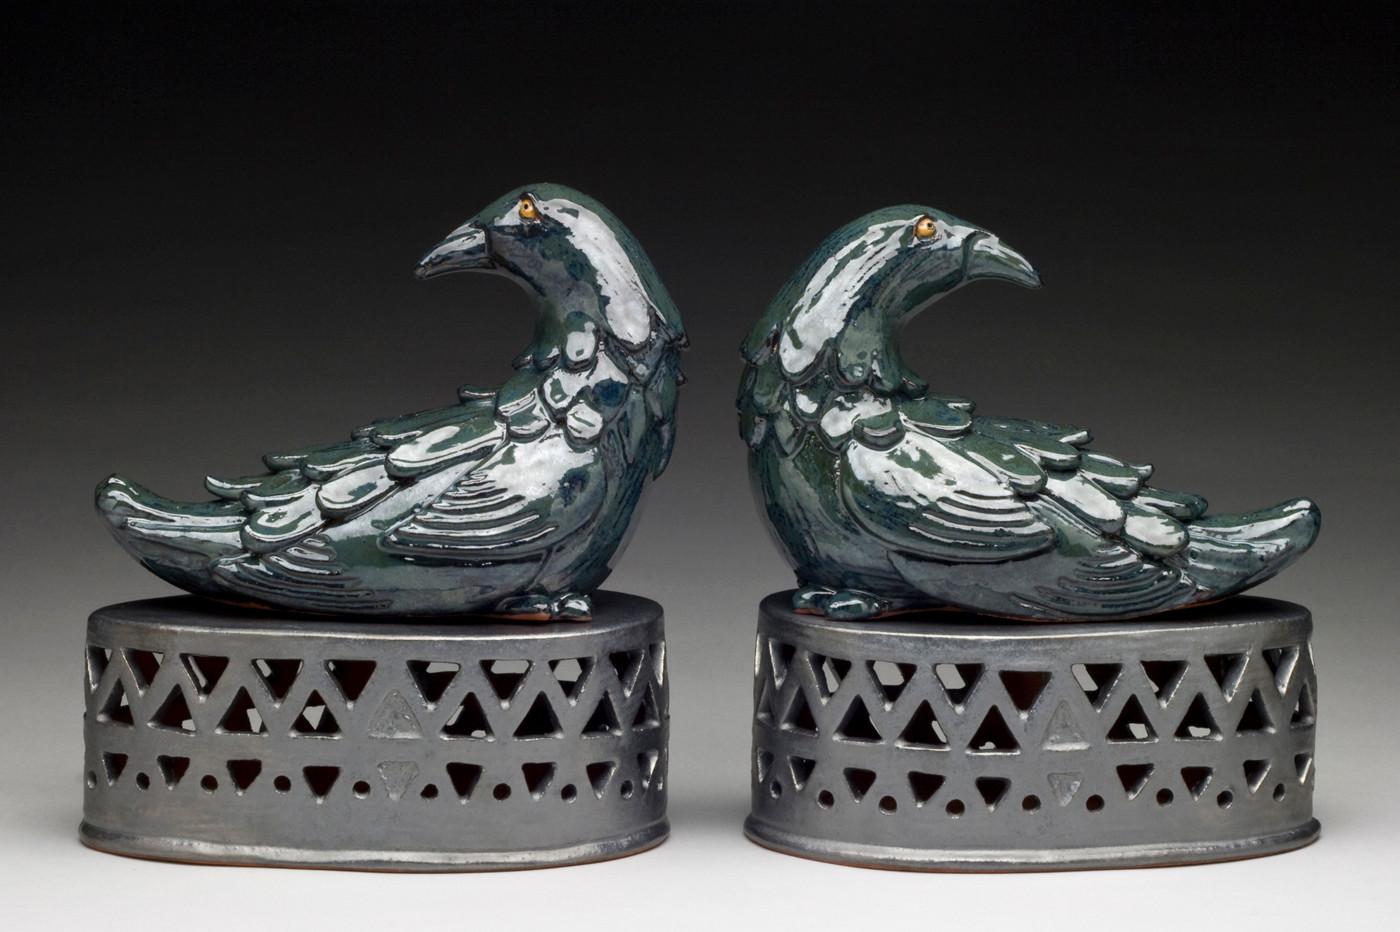 Pair of Ravens by Lynne Lofton